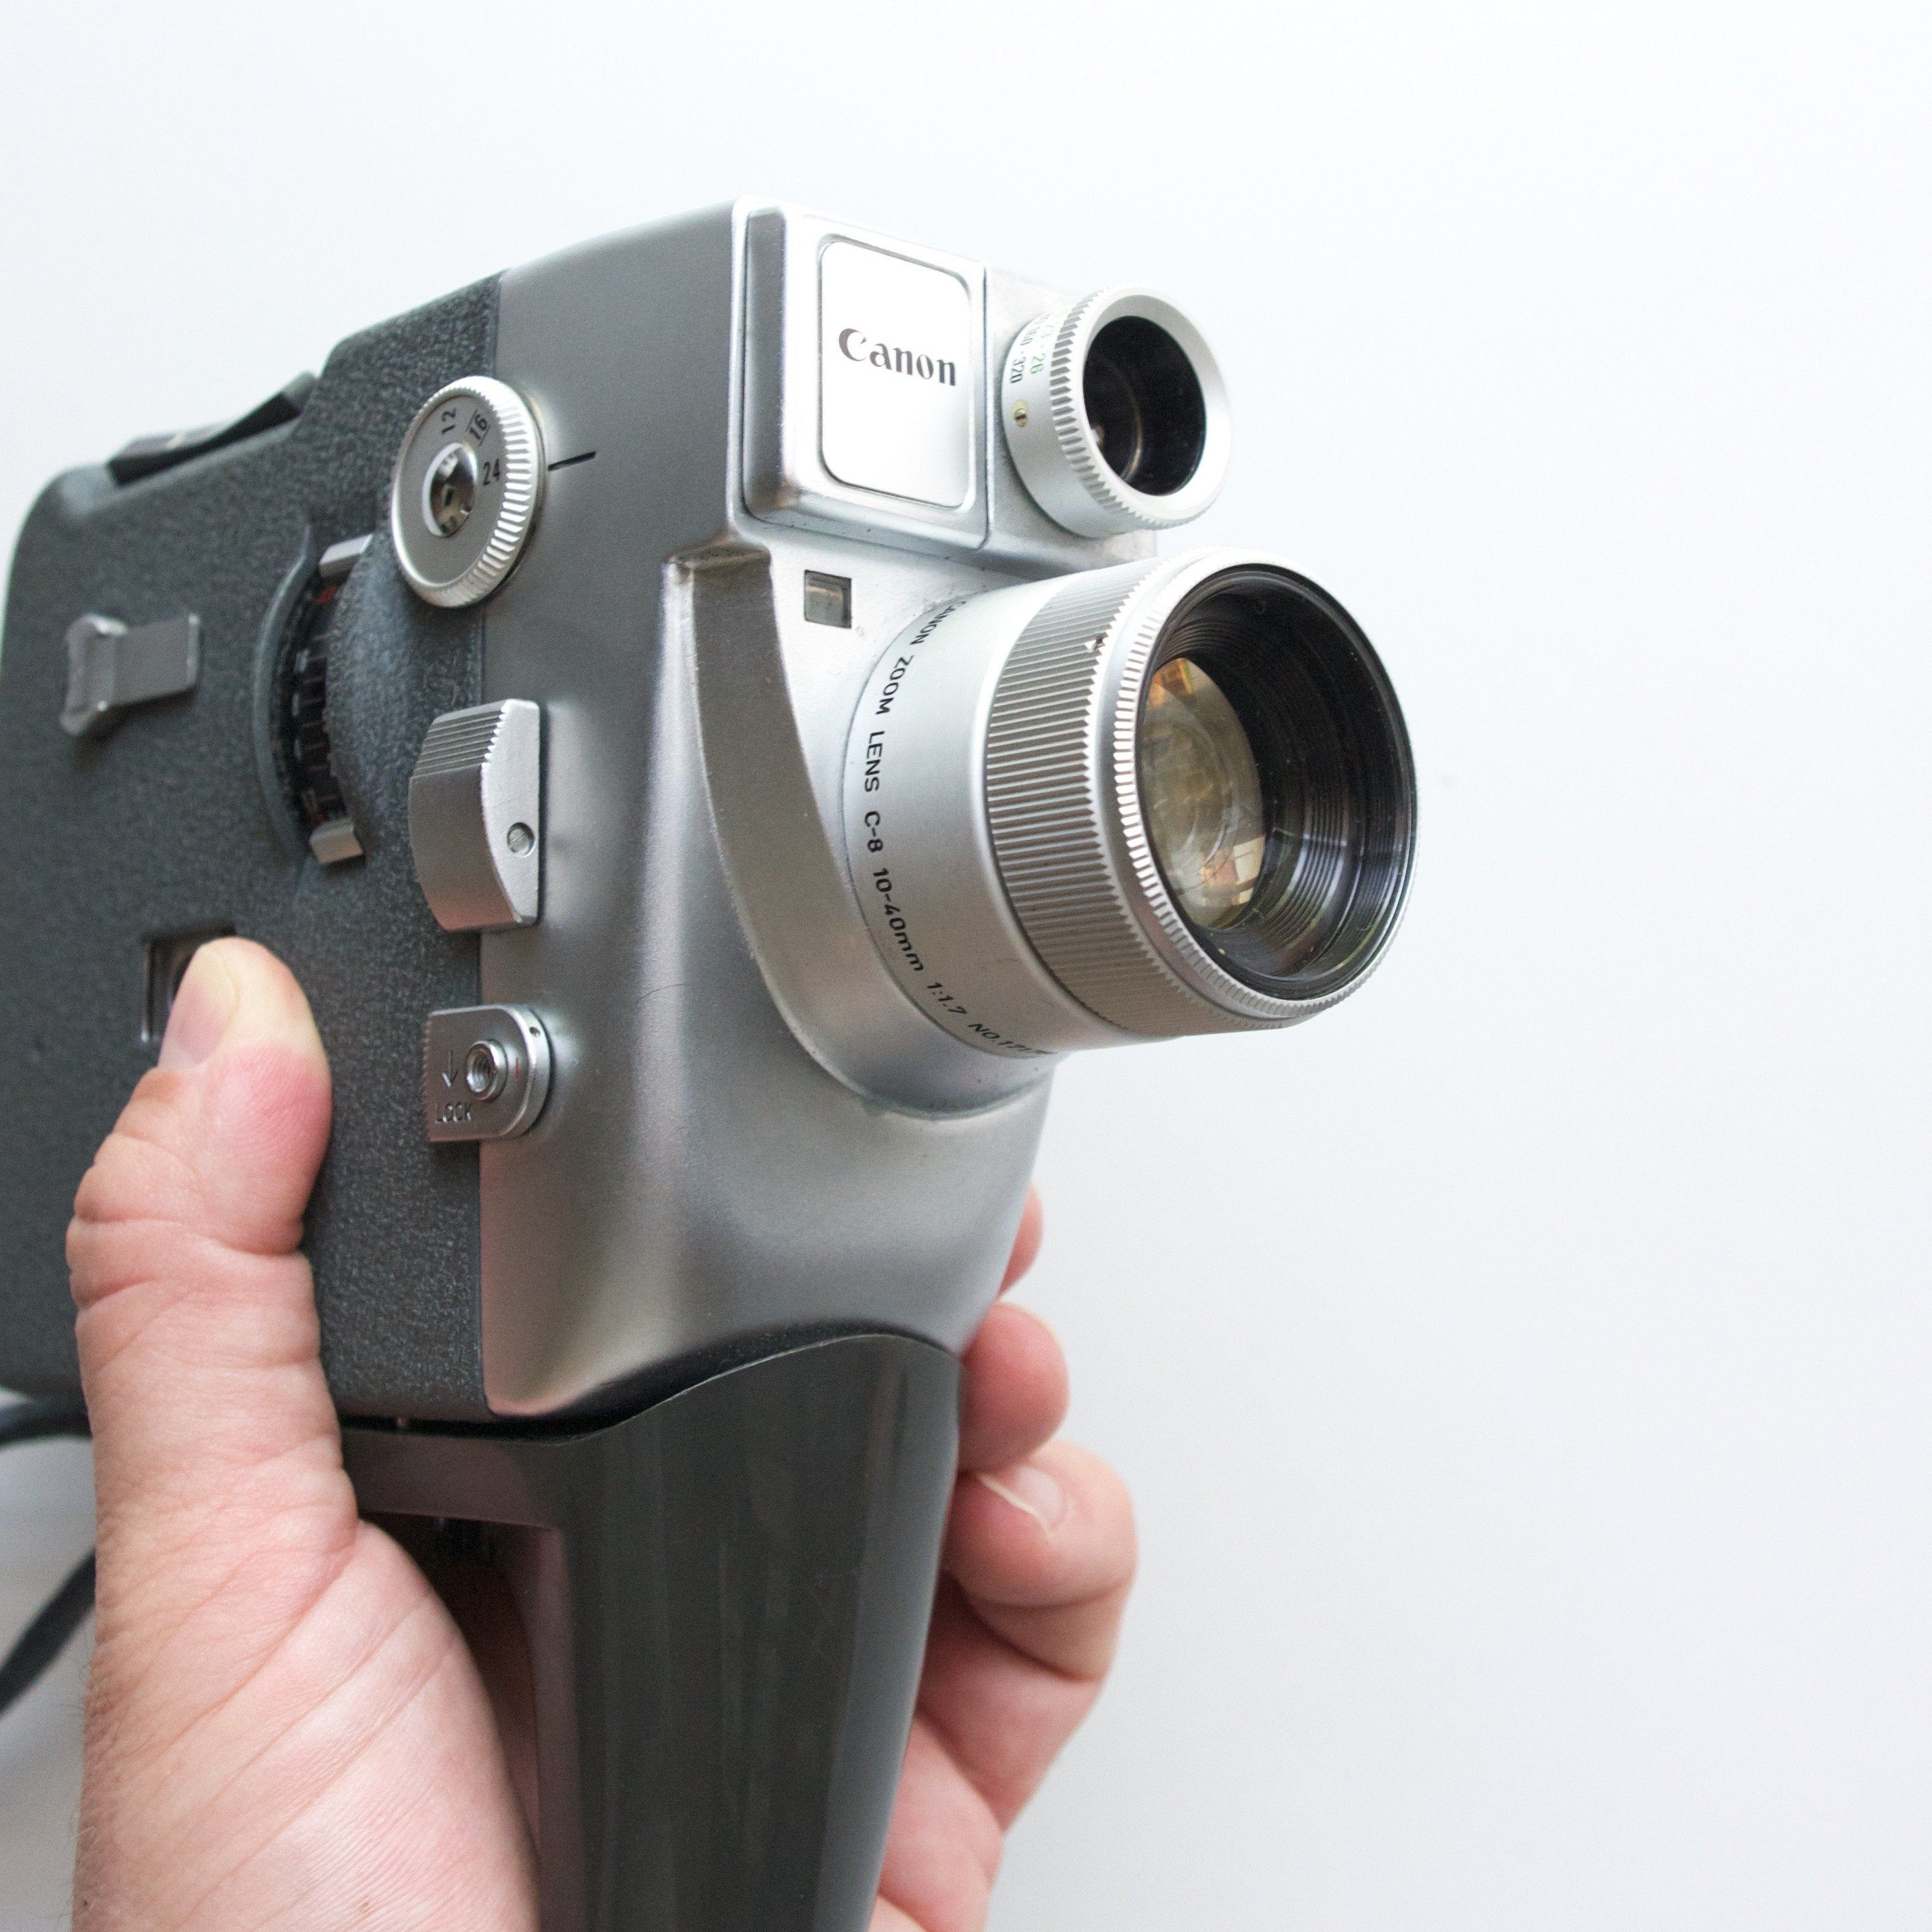 Canon Motor Zoom Eee 8mm Film Camera Leather Case Filmmaking Vintage Film Vintage Cinema Movie Camera In 2020 Vintage Camera Vintage Film